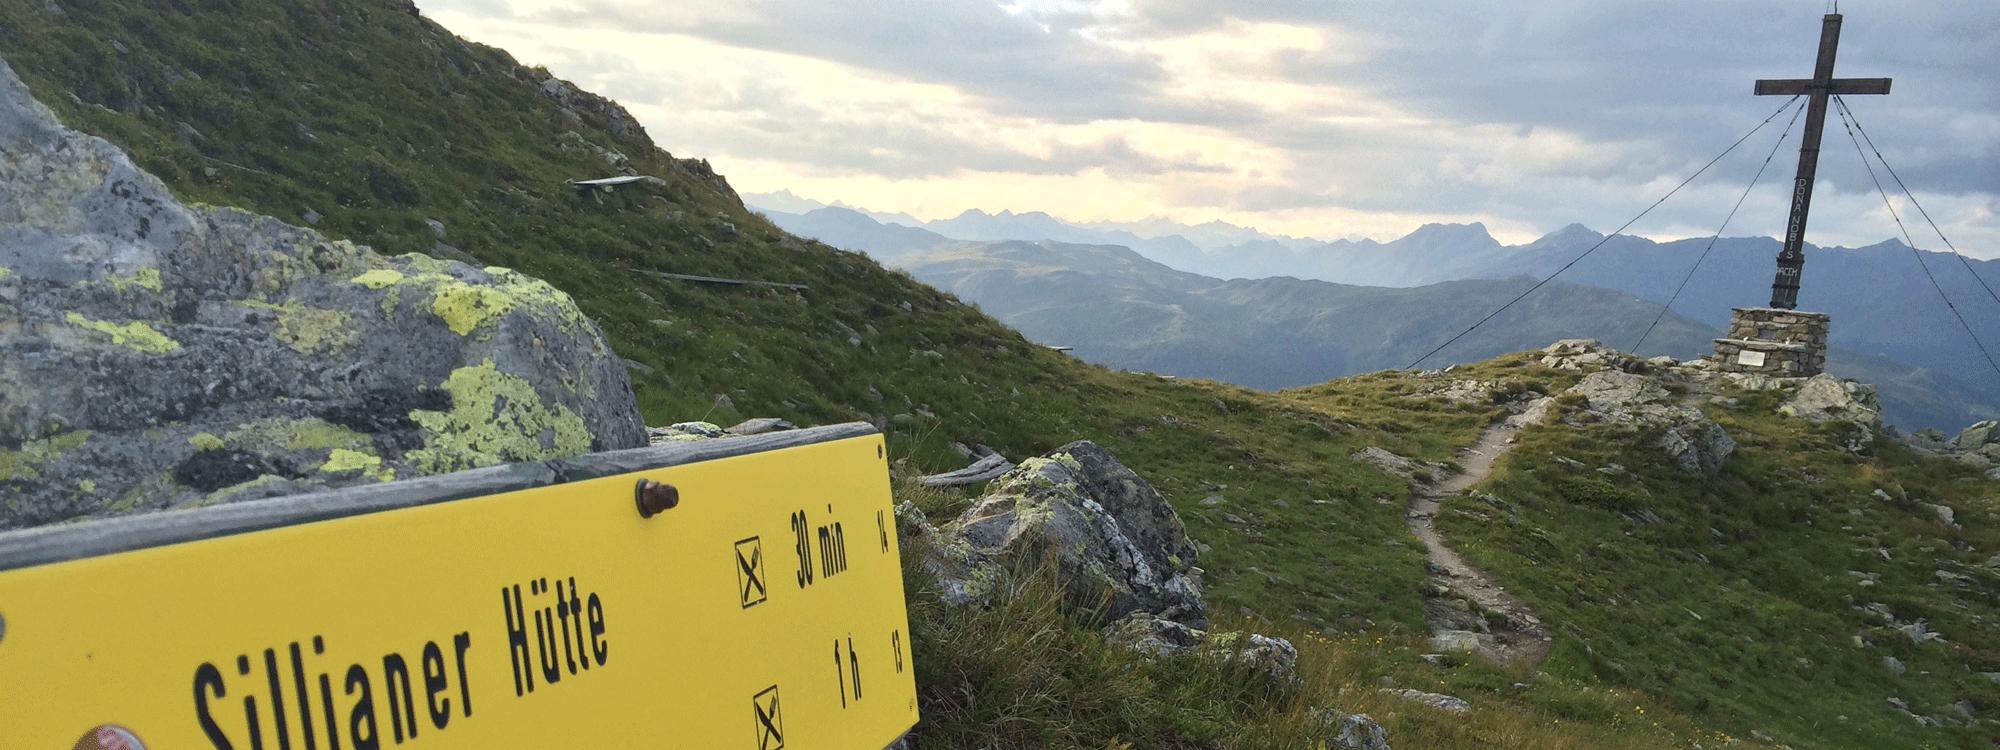 heimkehrerkreuz-2